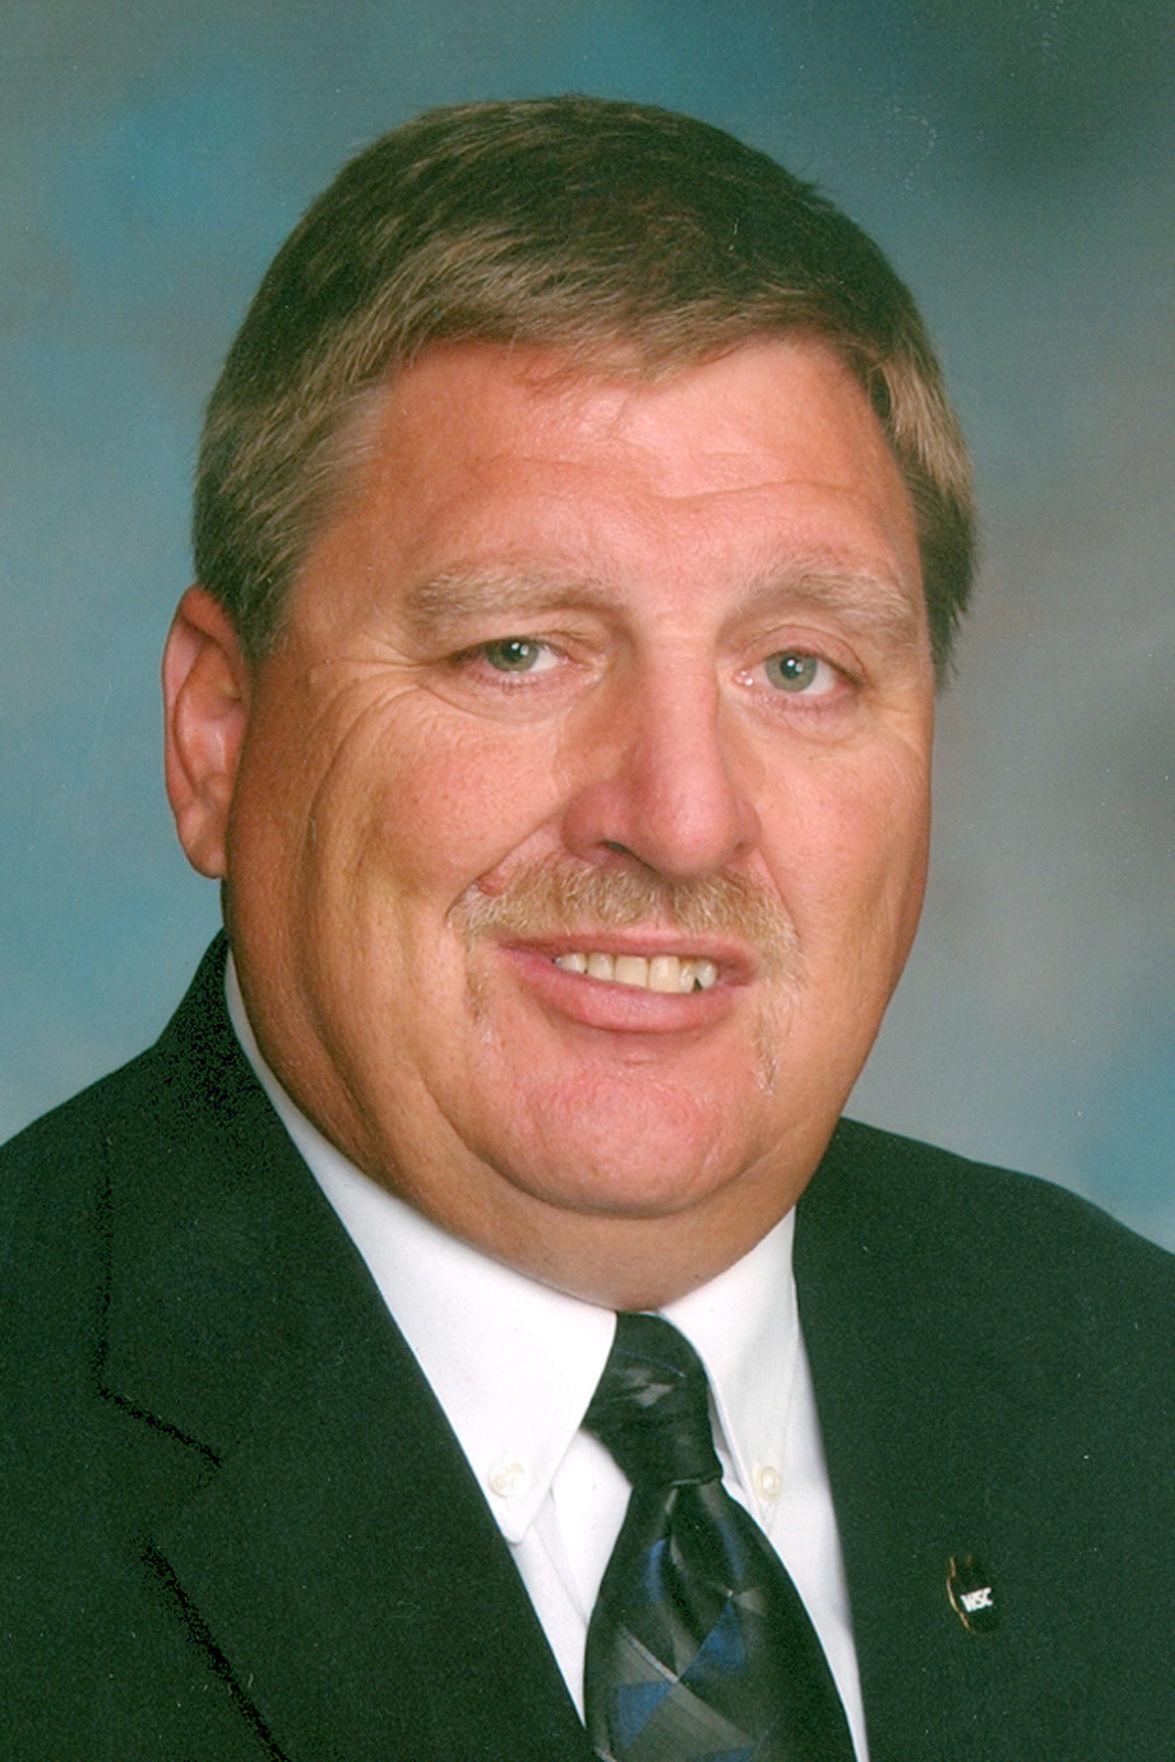 Dan McLaughlin